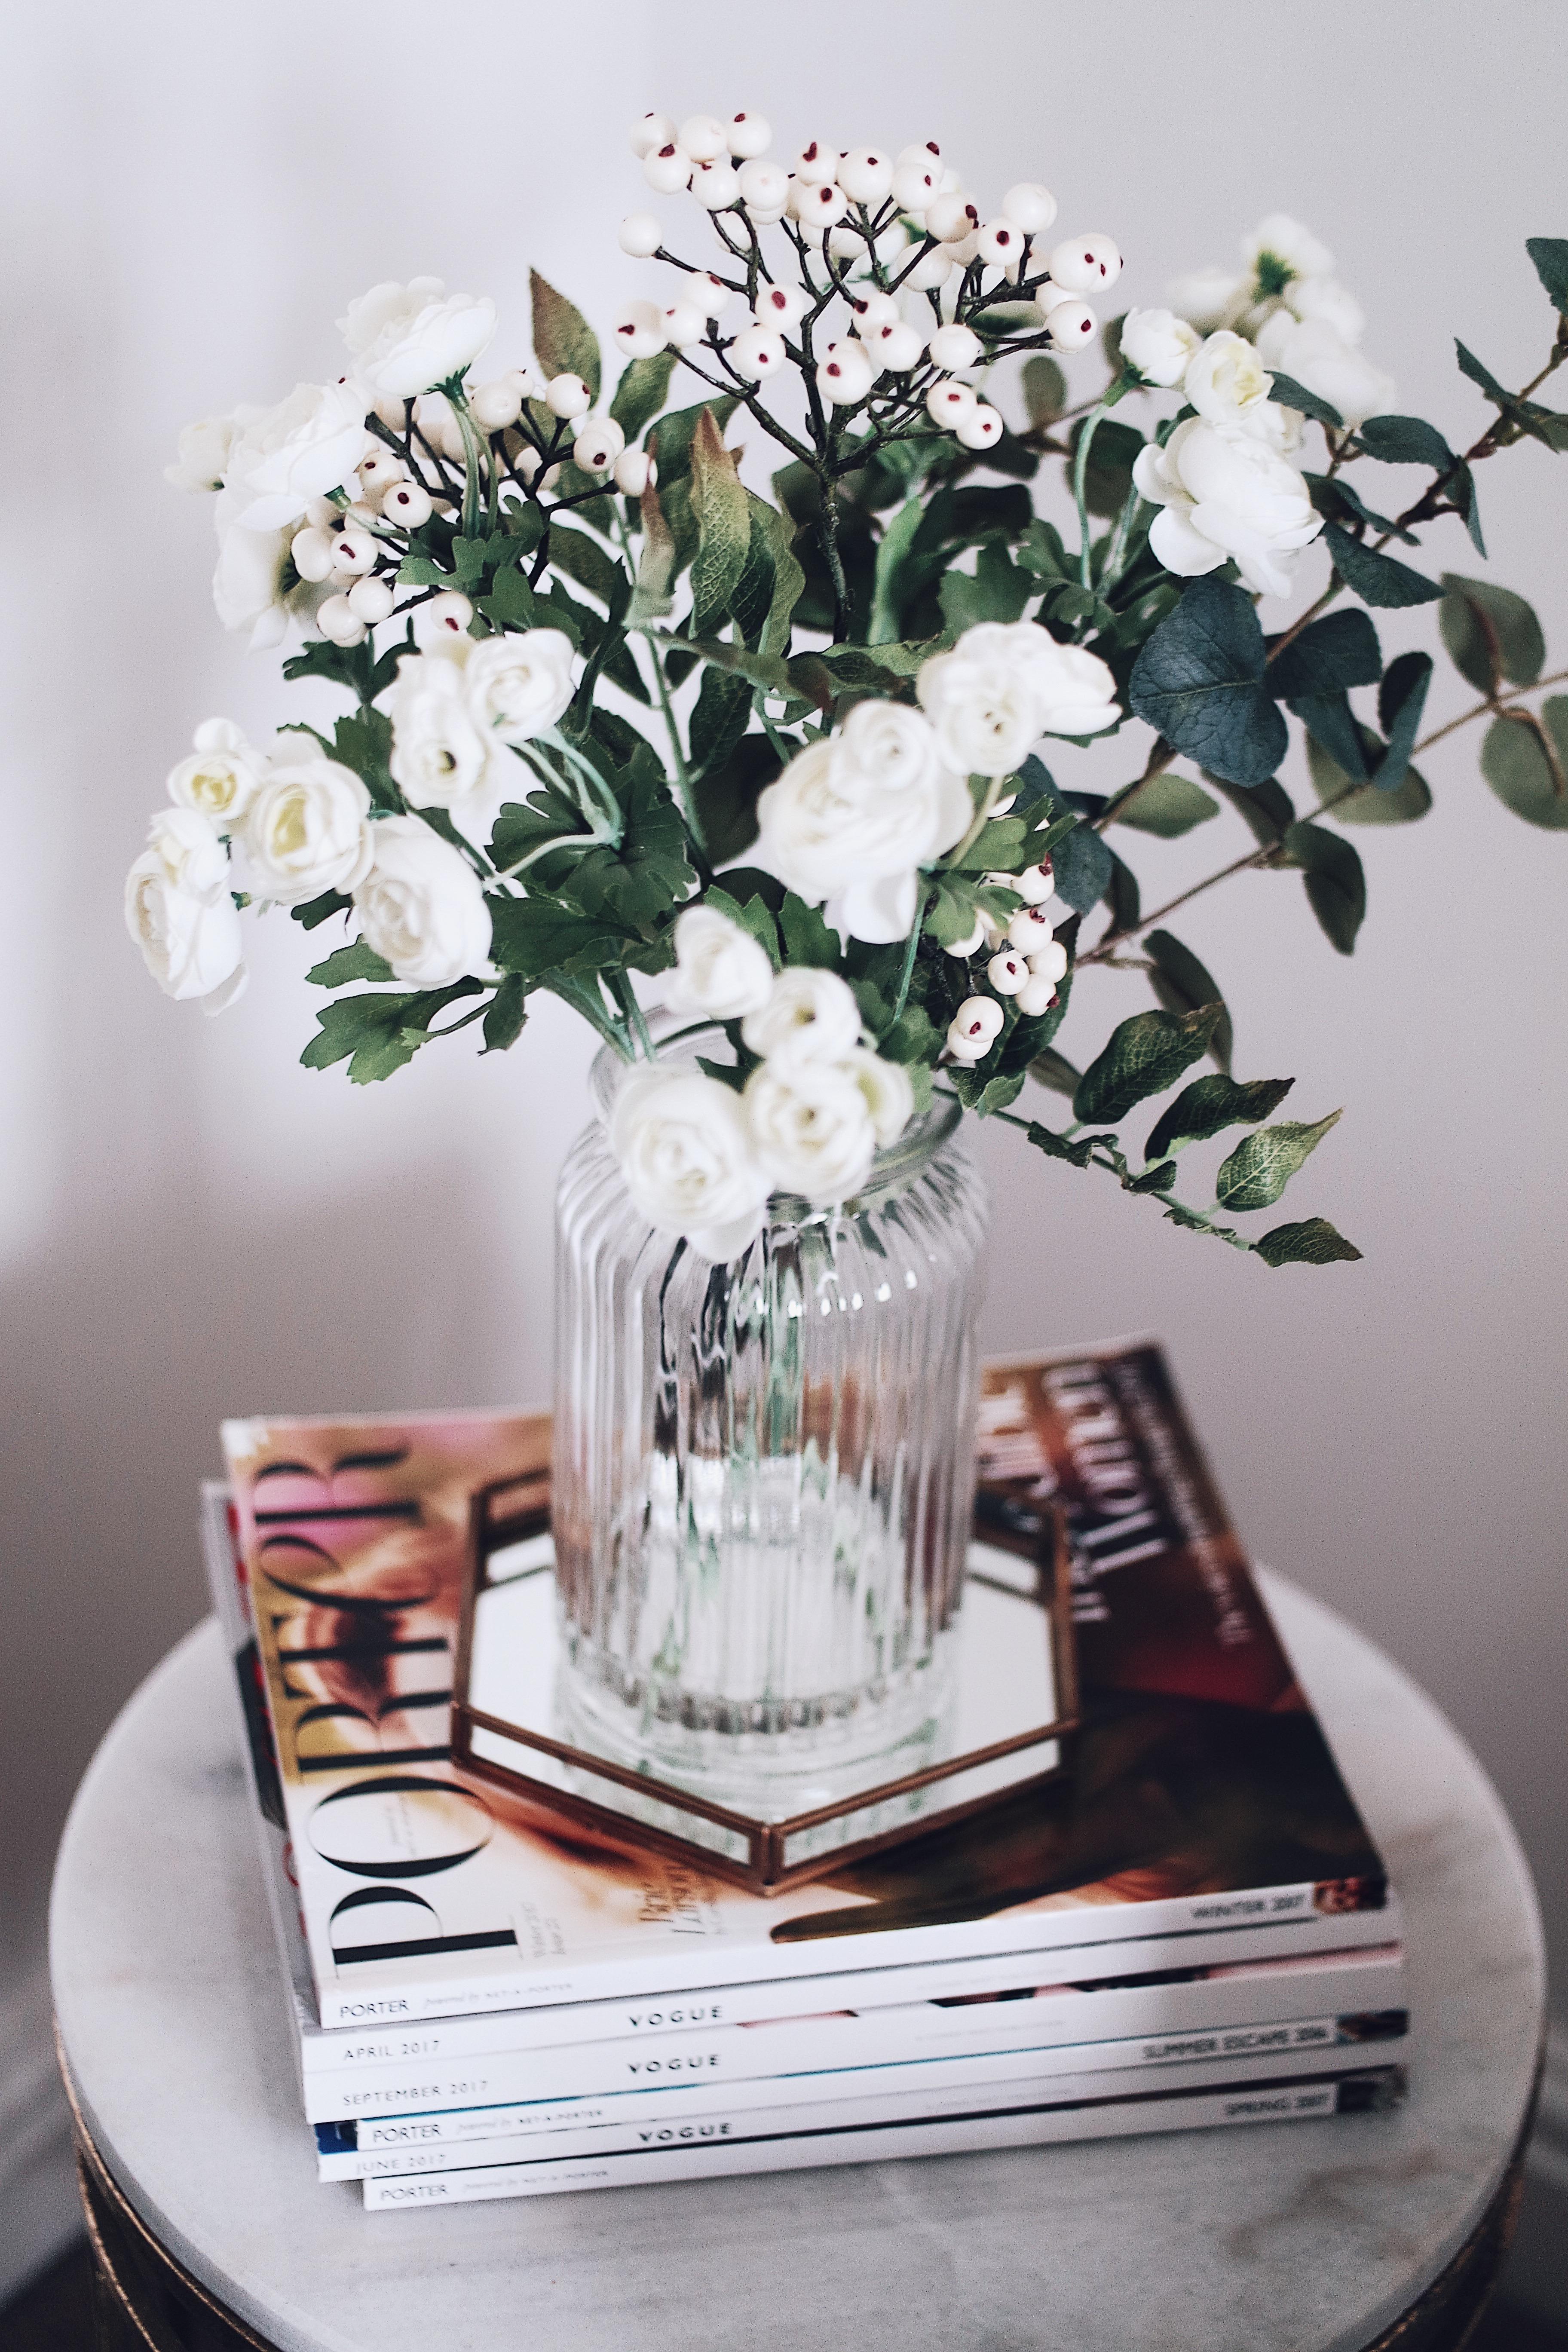 Laura Ashley - Flowers